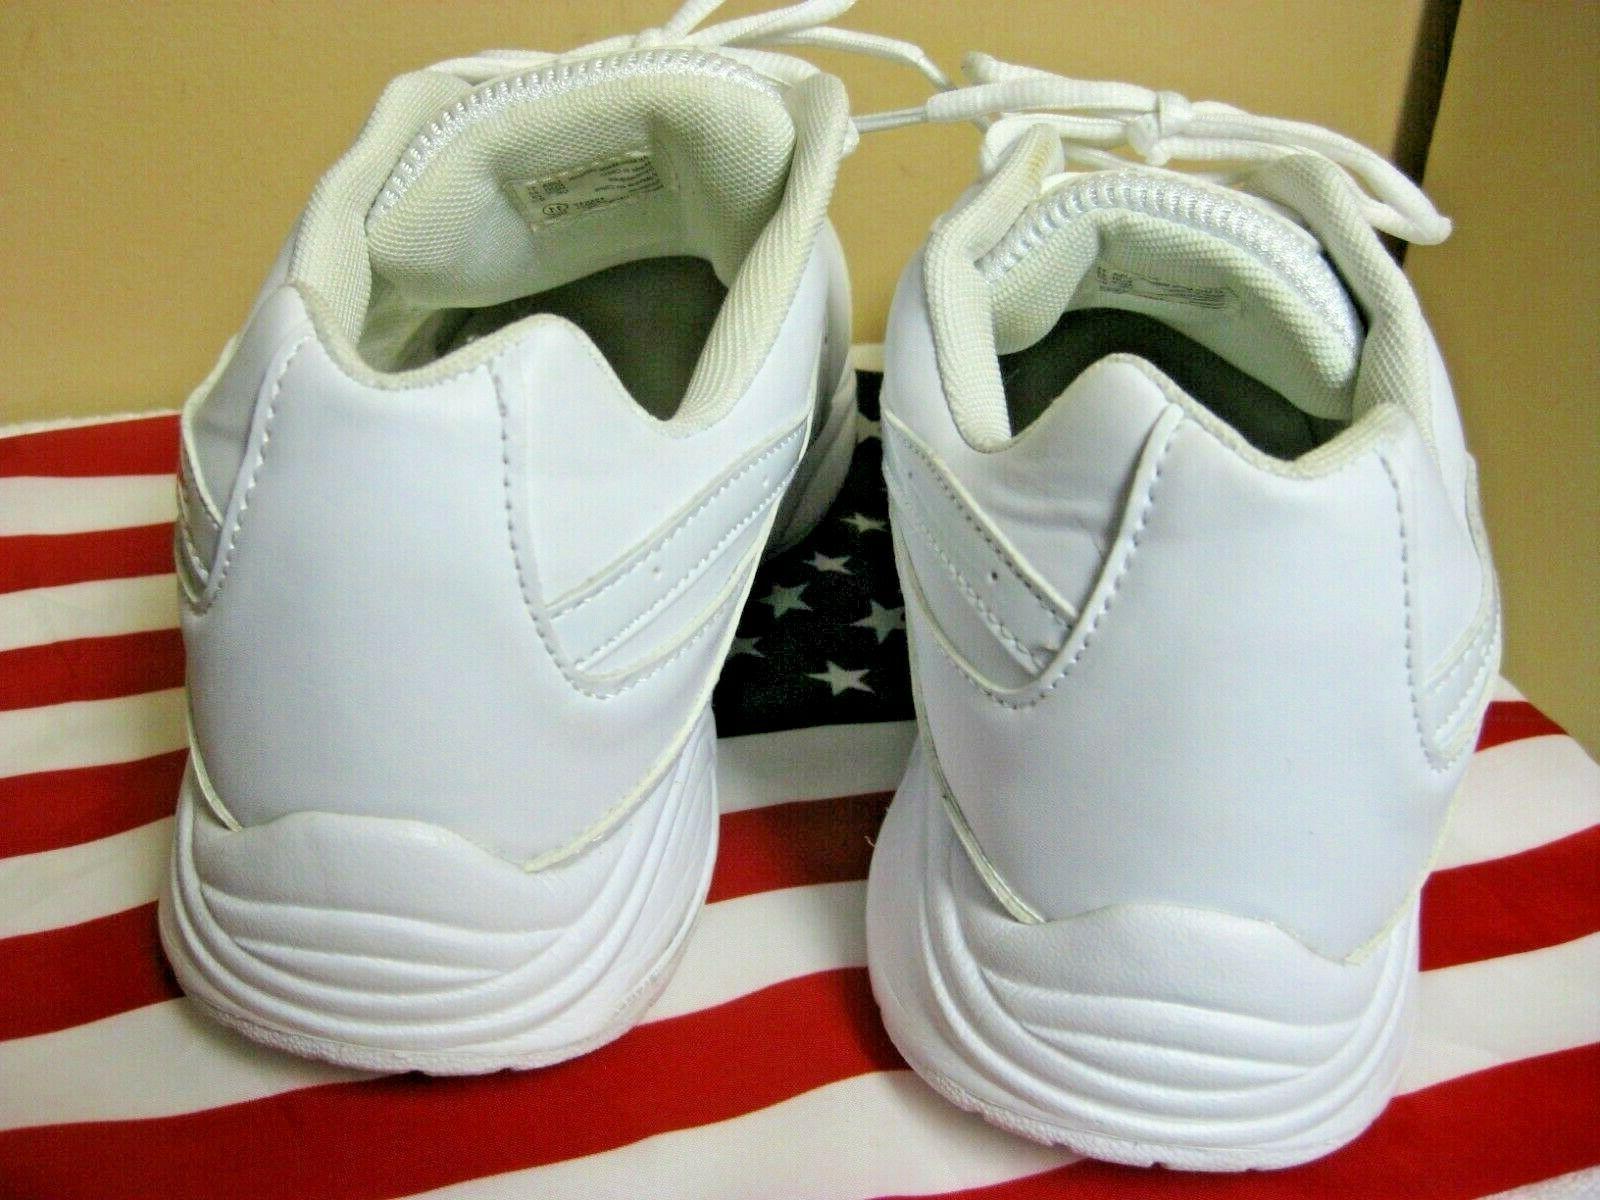 CHAMPION Sneakers Tennis Shoes Women's Size 11